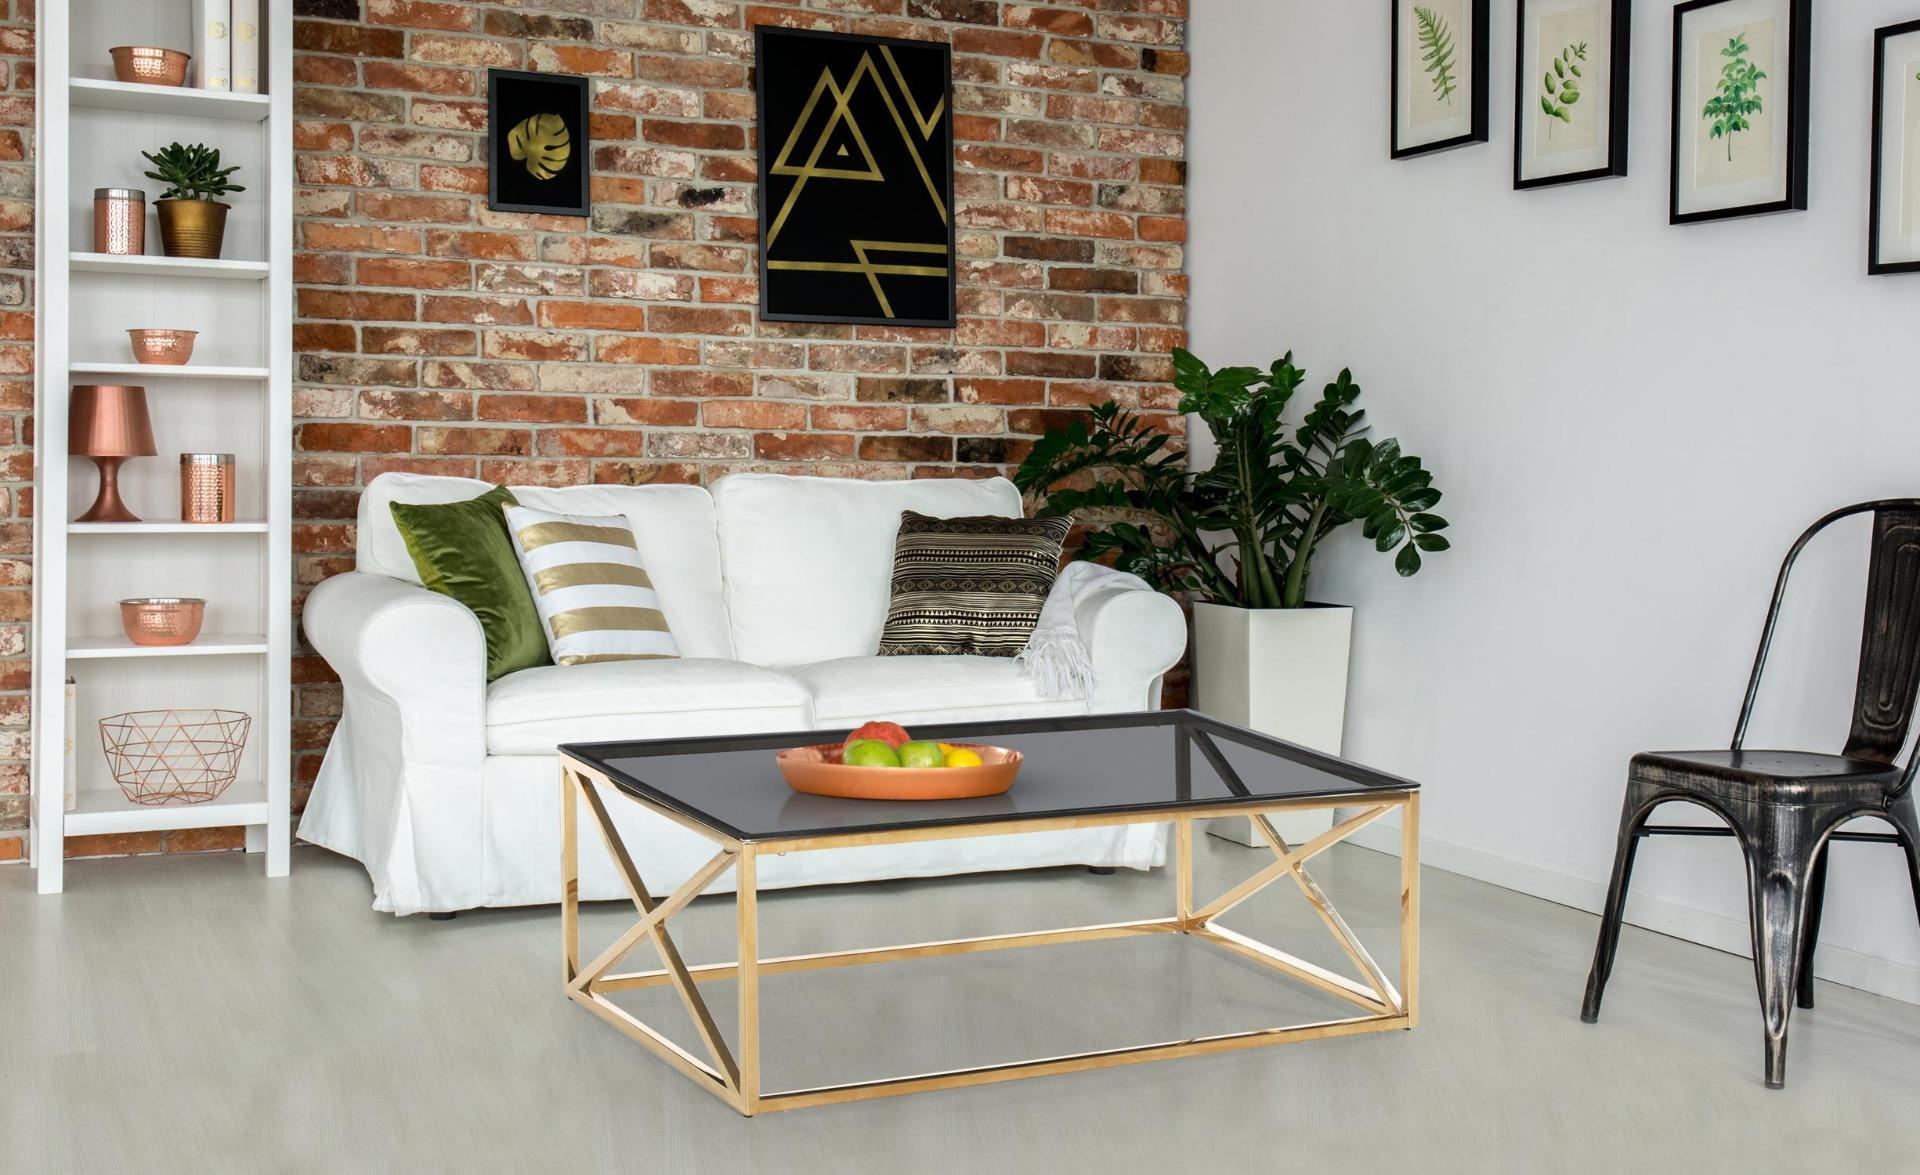 Sydney salontafel in gerookt glas en gouden poten